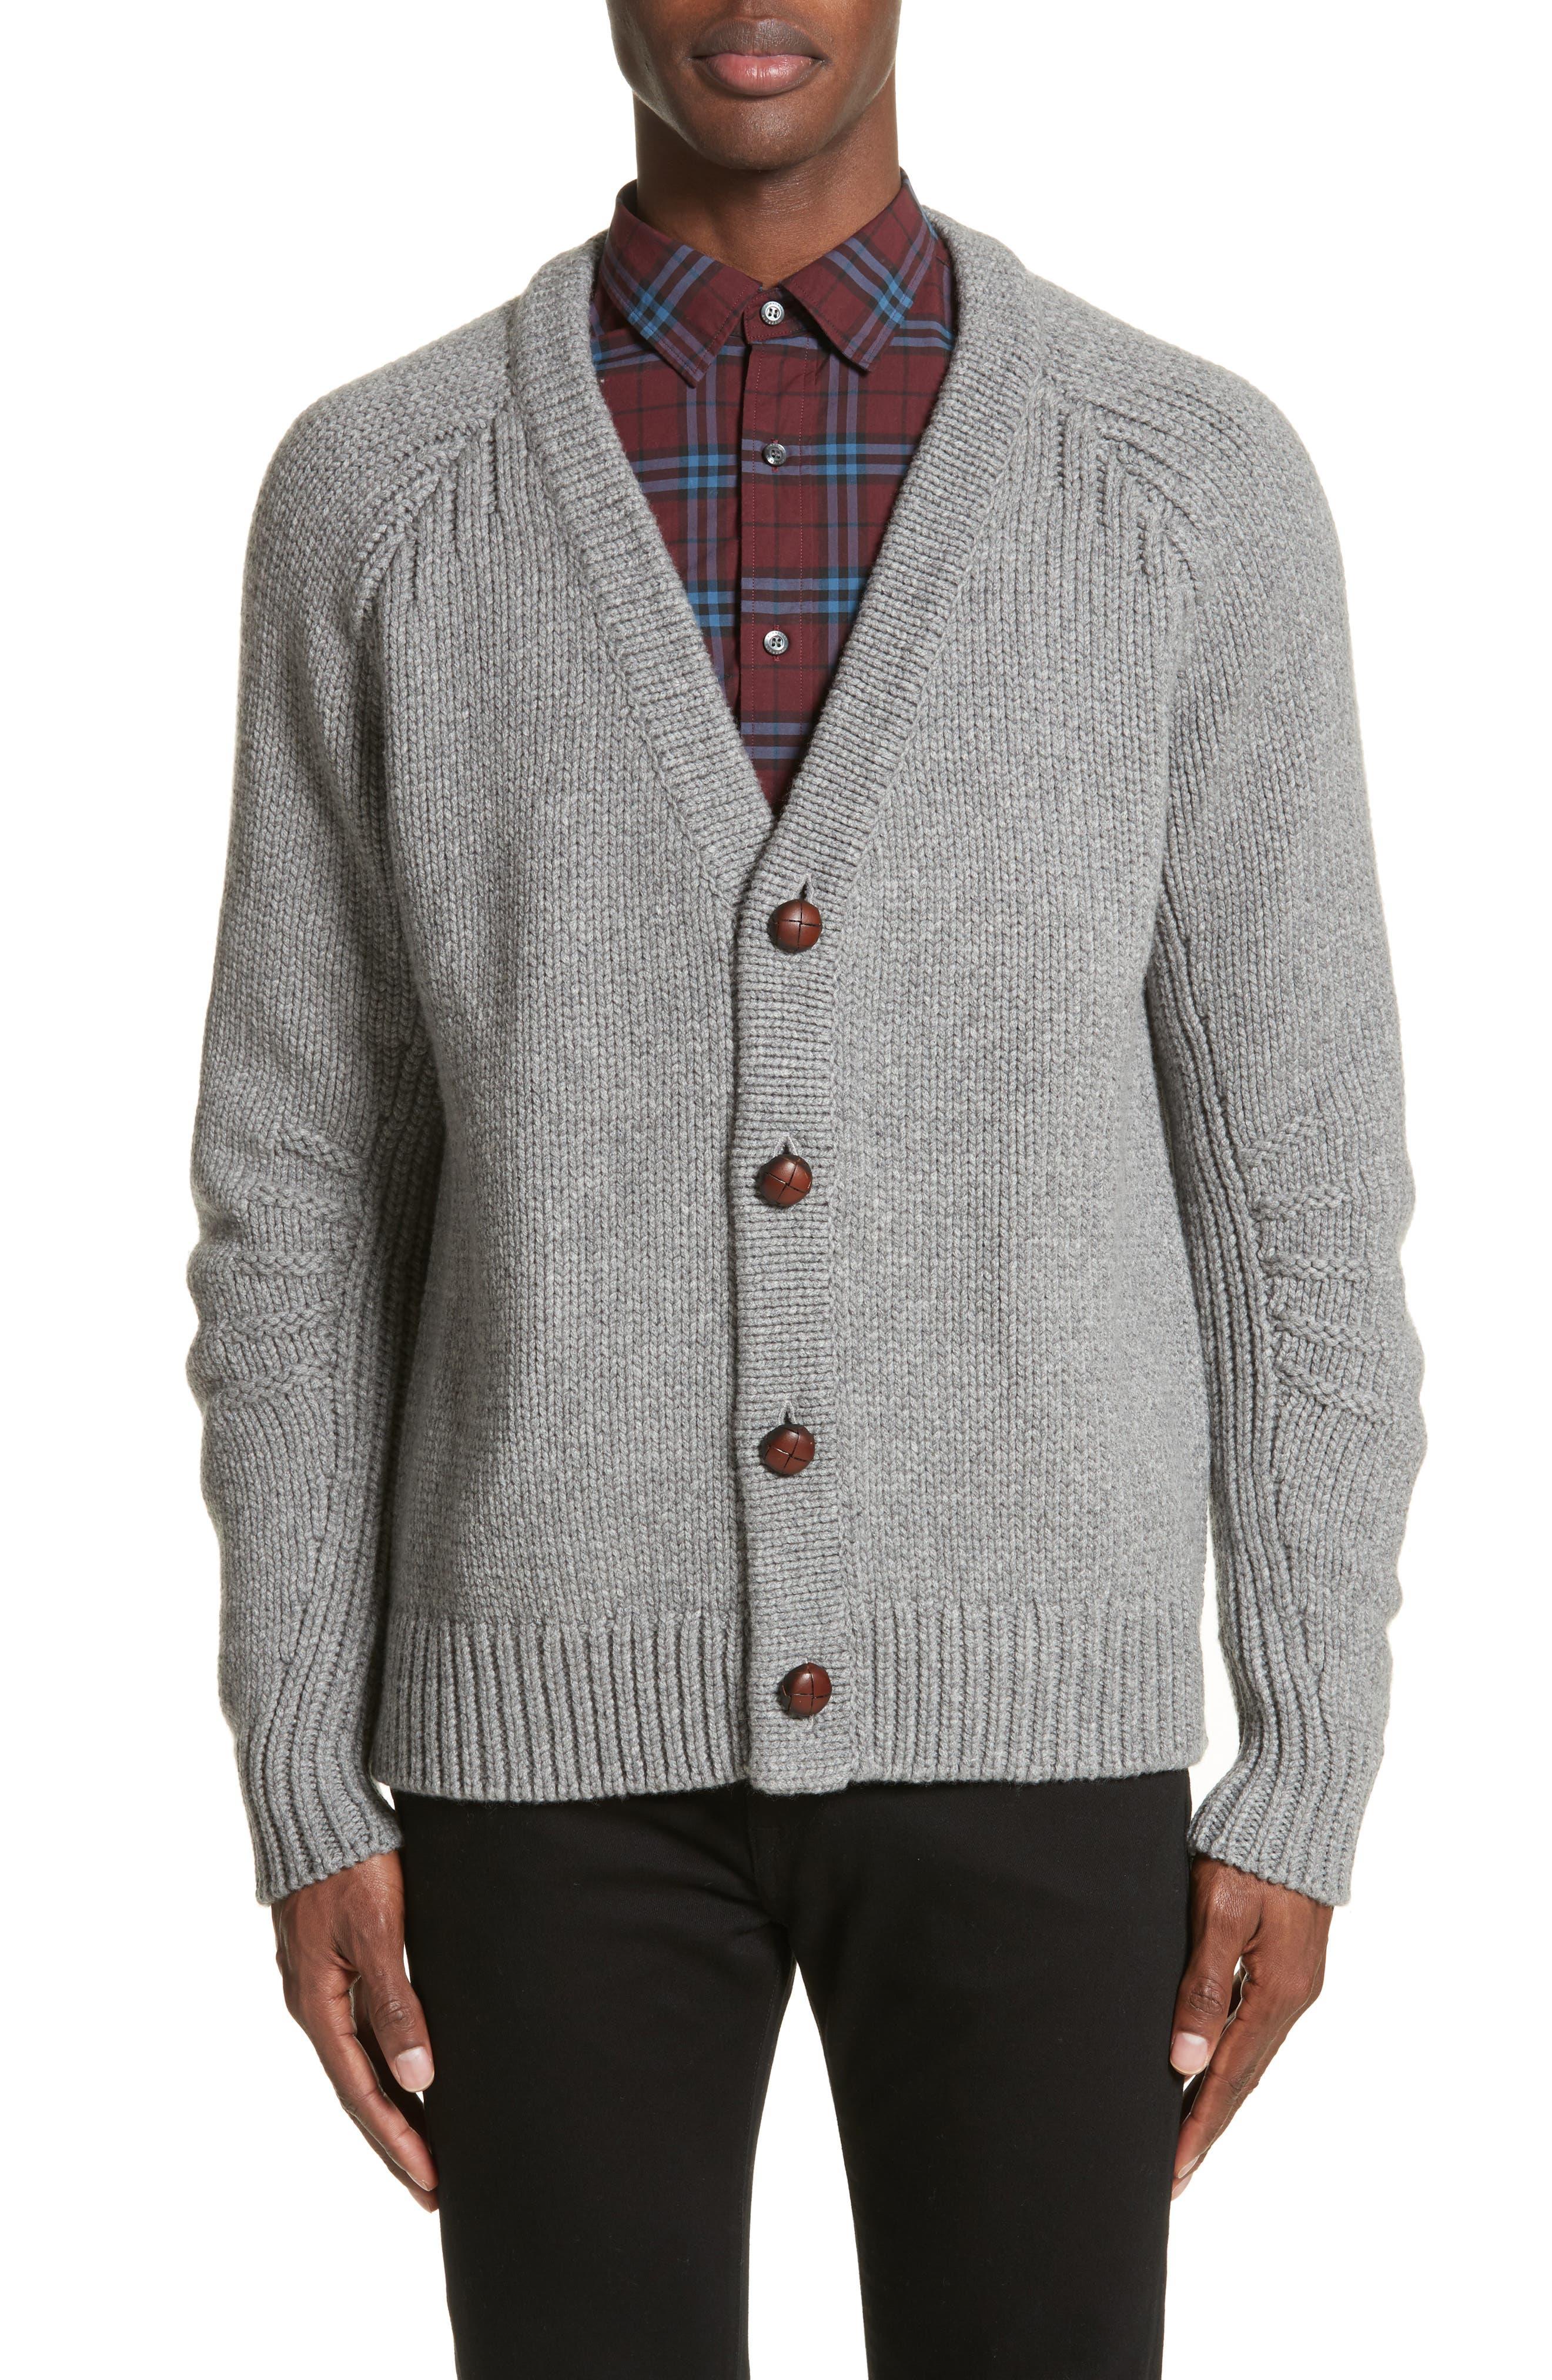 Caldwell Wool & Cashmere Cardigan,                         Main,                         color, Mid Grey Melange